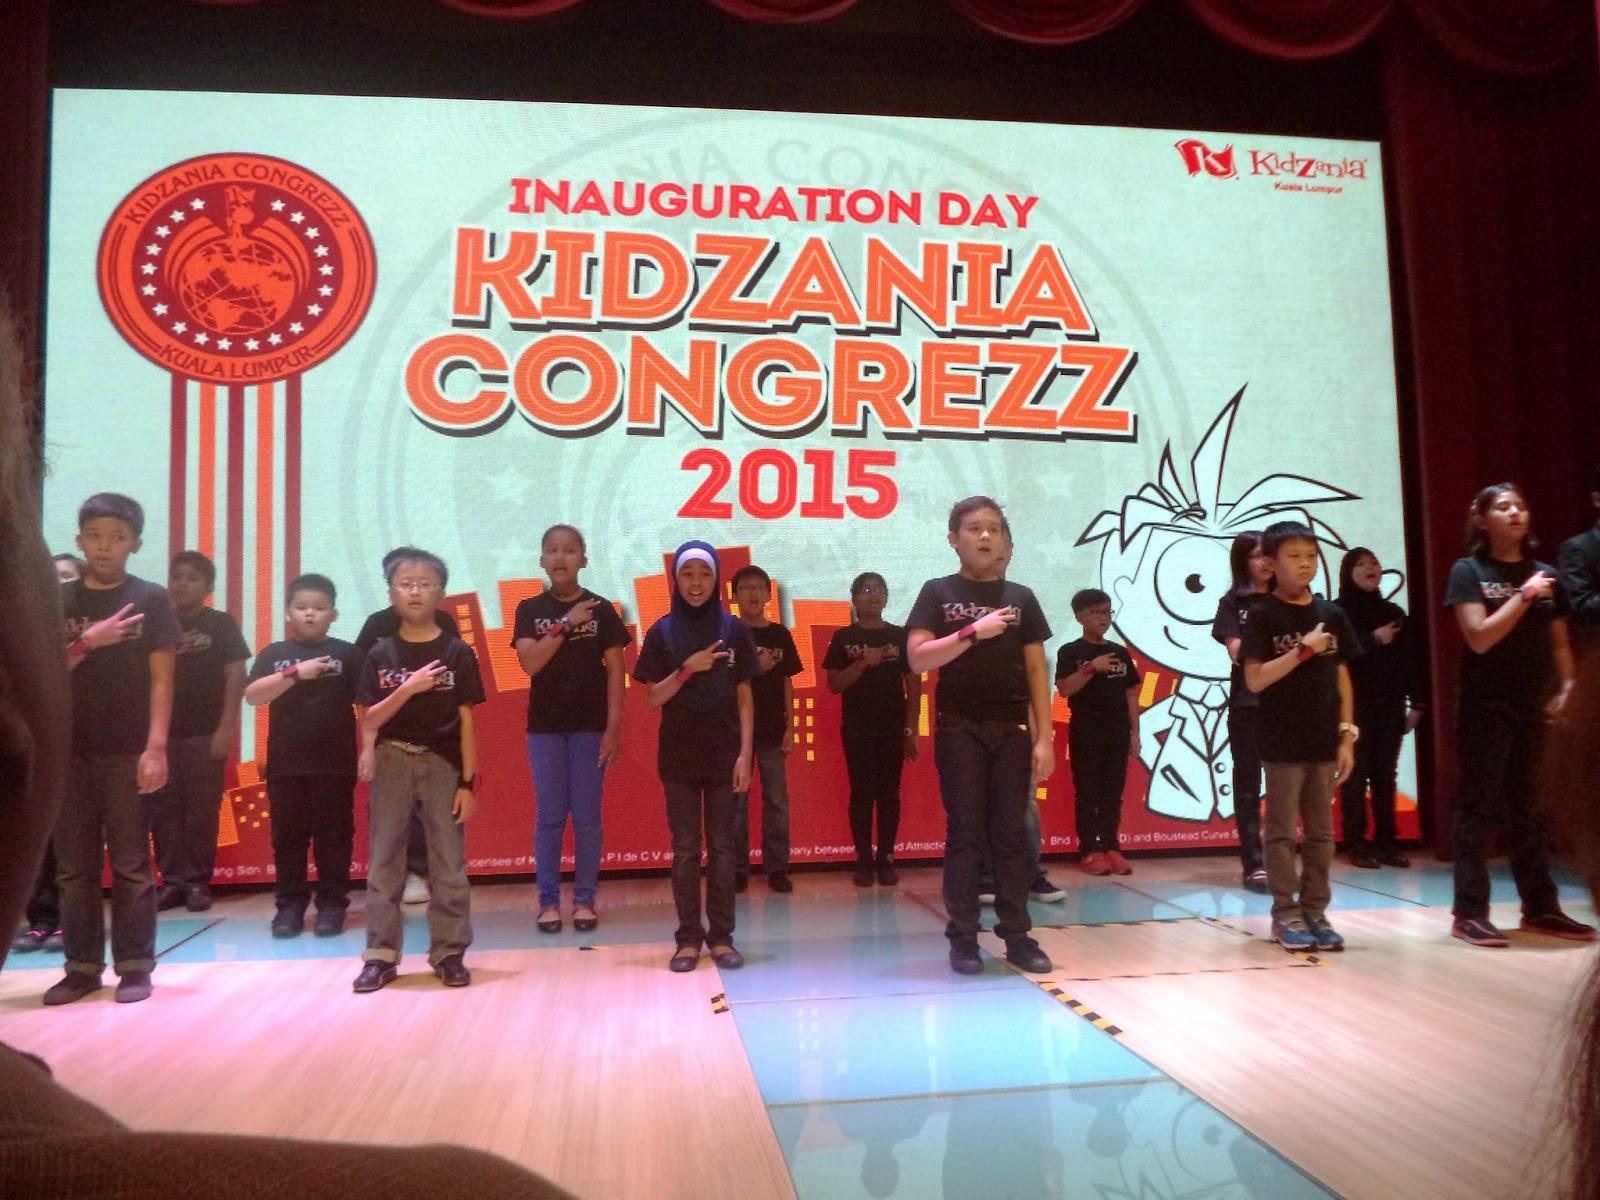 kidzania congrezz kids